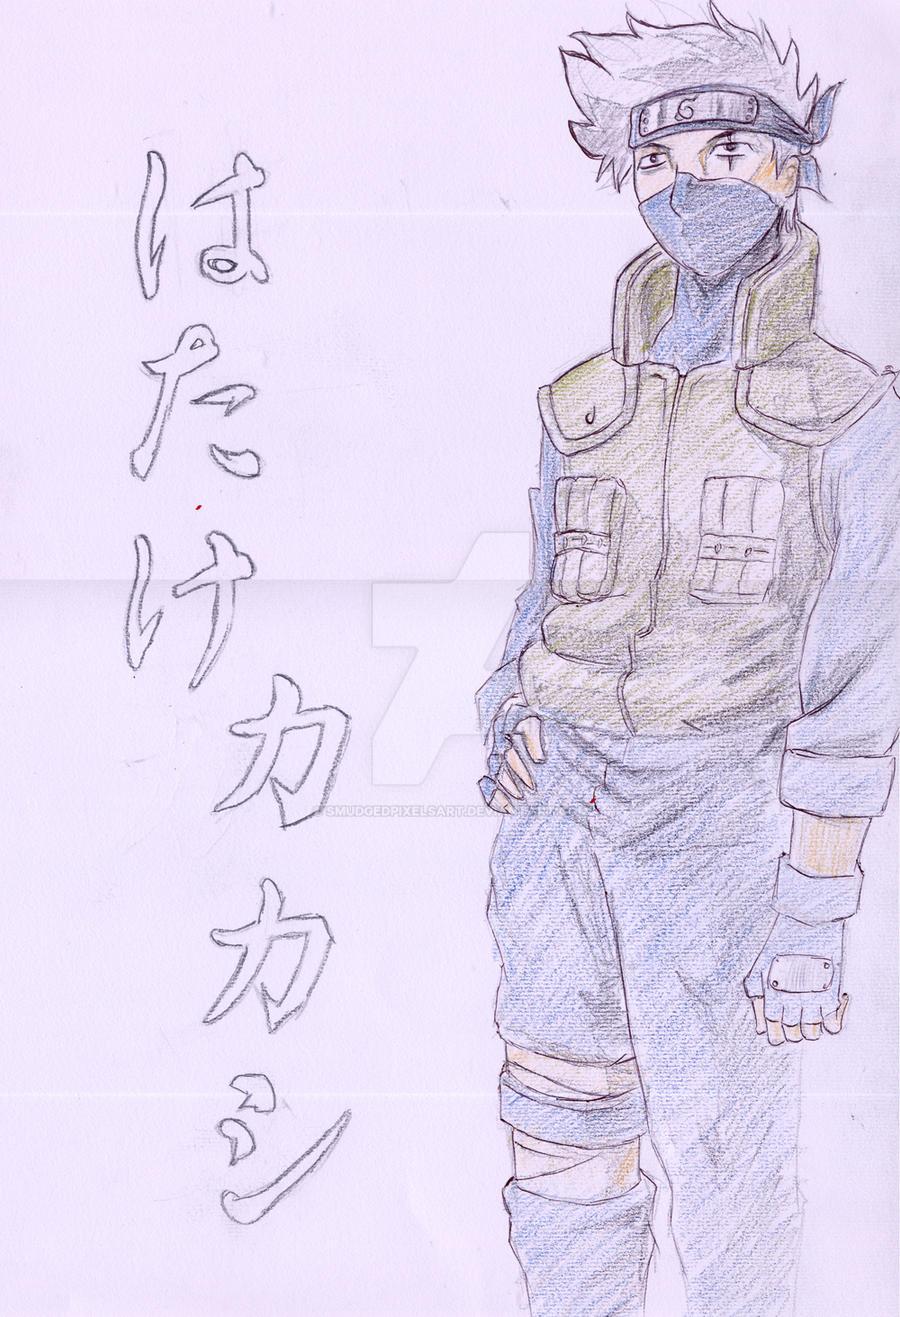 Hatake Kakashi by SmudgedPixelsArt